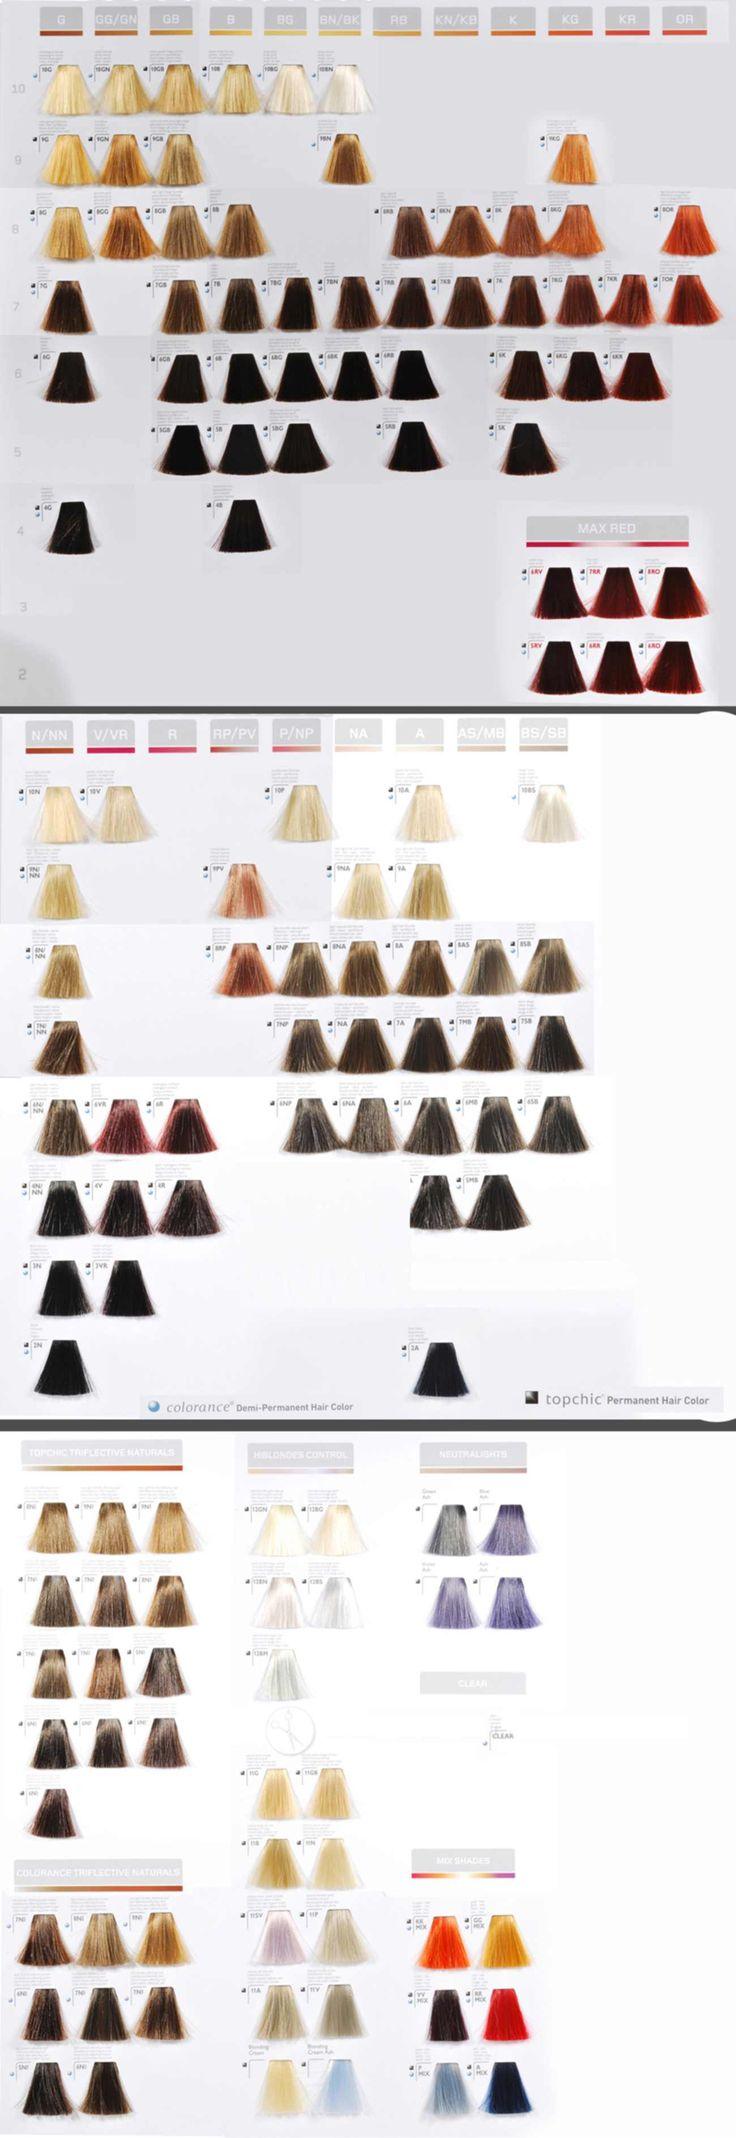 goldwell color chart 1300.jpg (1300×3778)